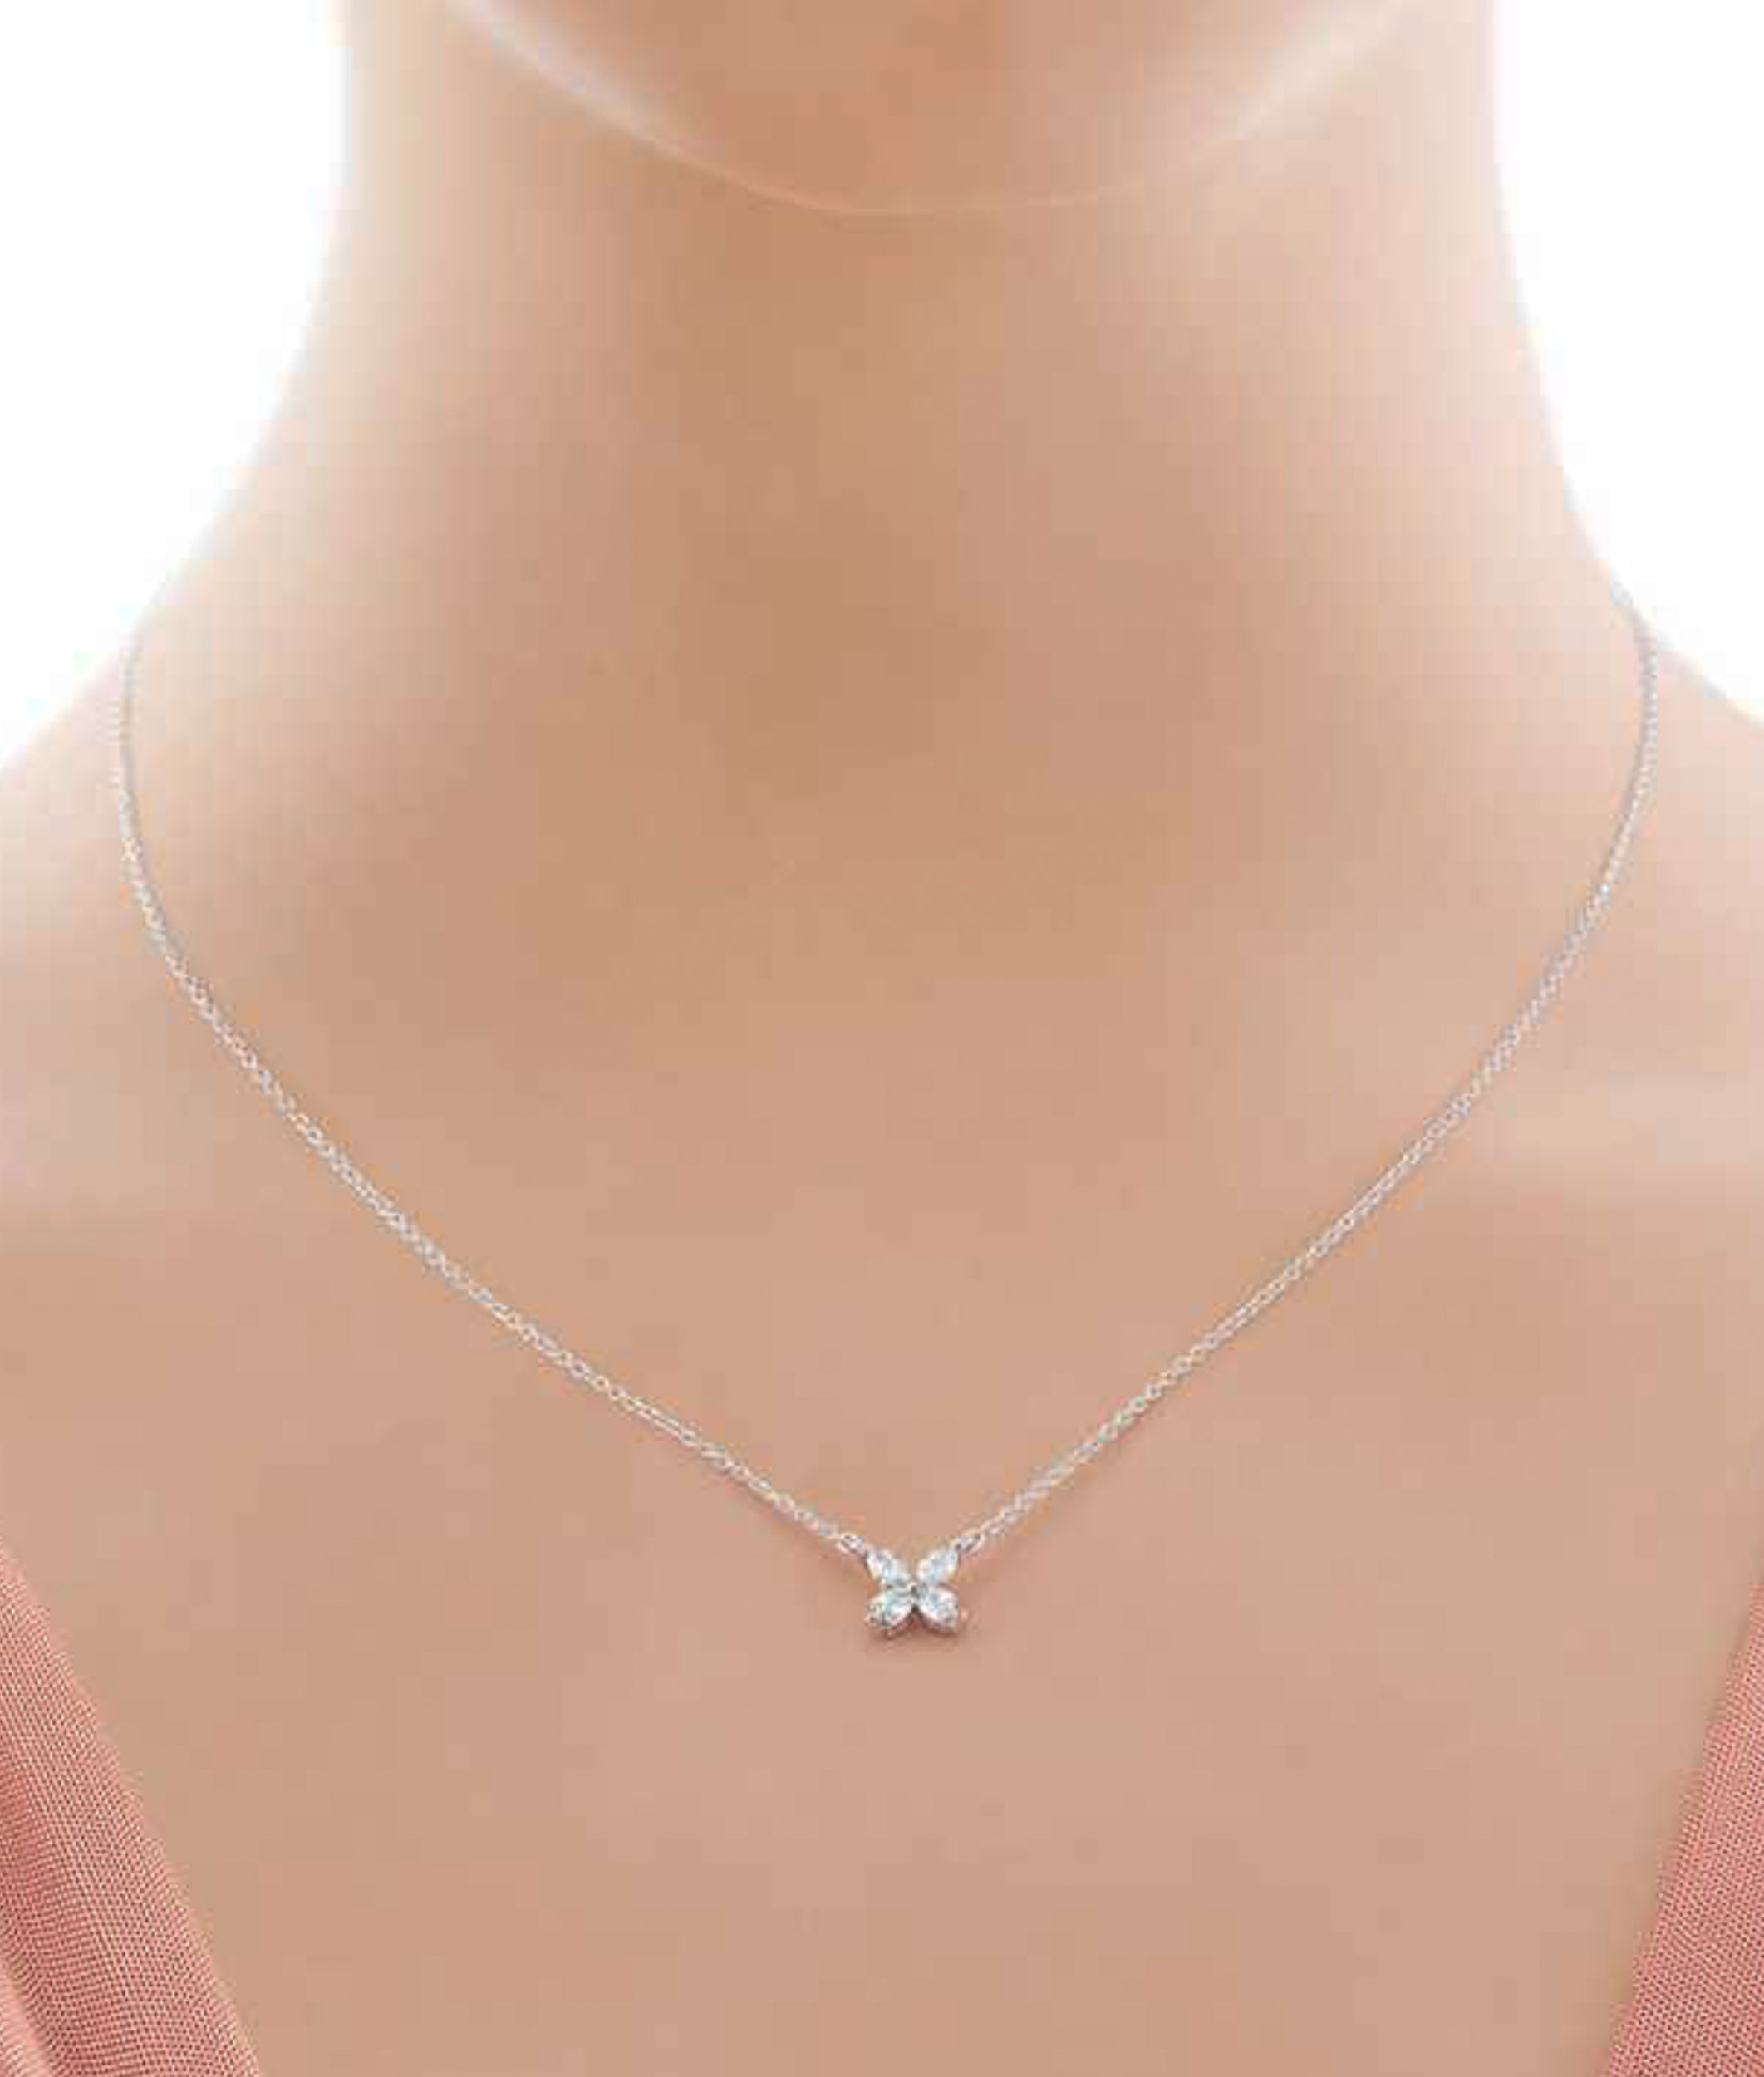 15d0588d7 Platinum Tiffany and Co. Victoria Diamond Pendant at 1stdibs